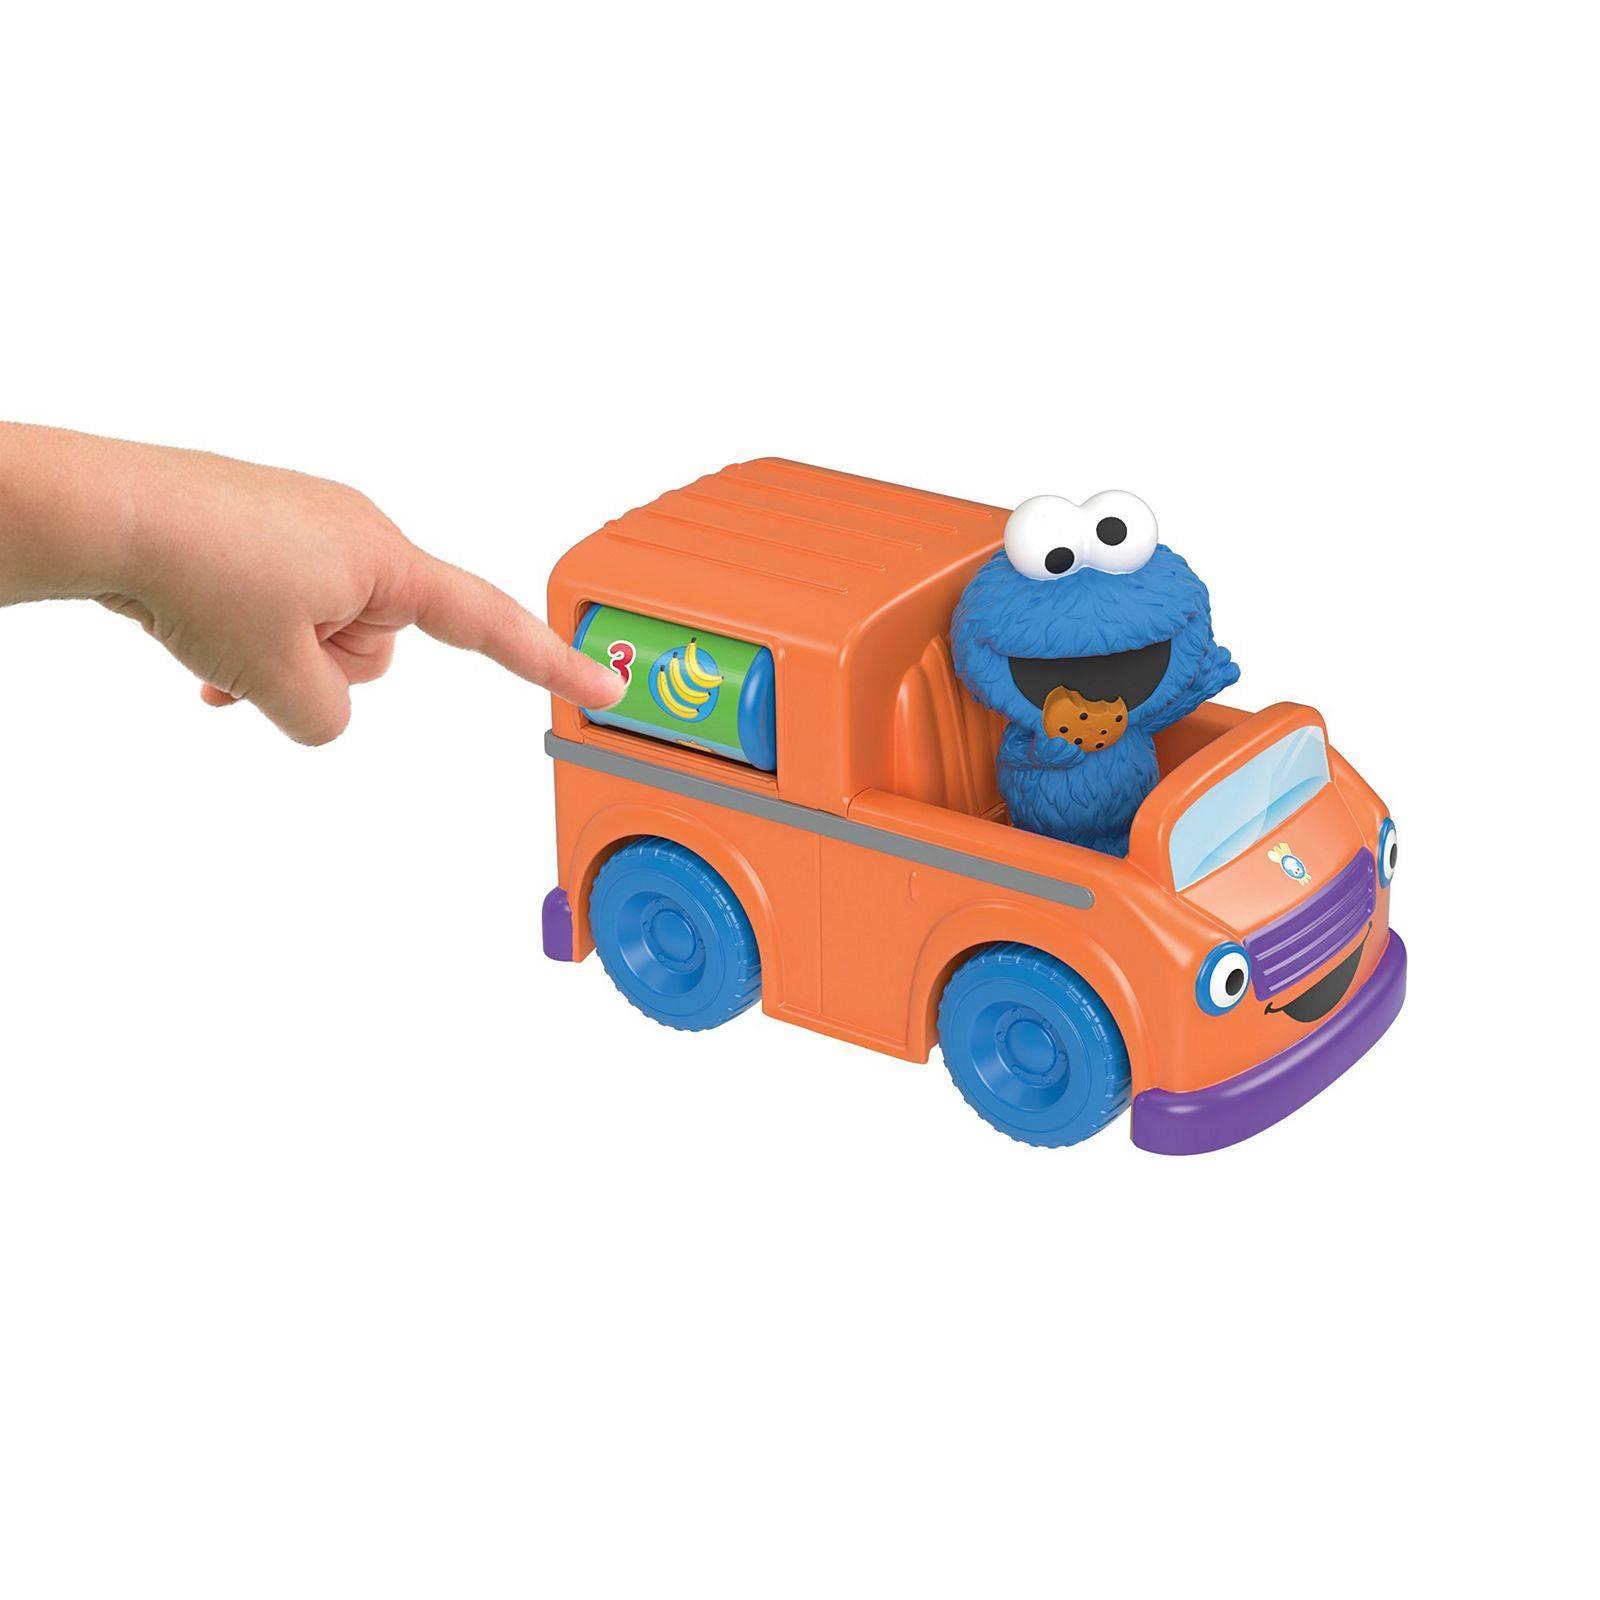 Food Truck do Come Come Vila Sésamo - Mattel FTC35 - Noy Brinquedos